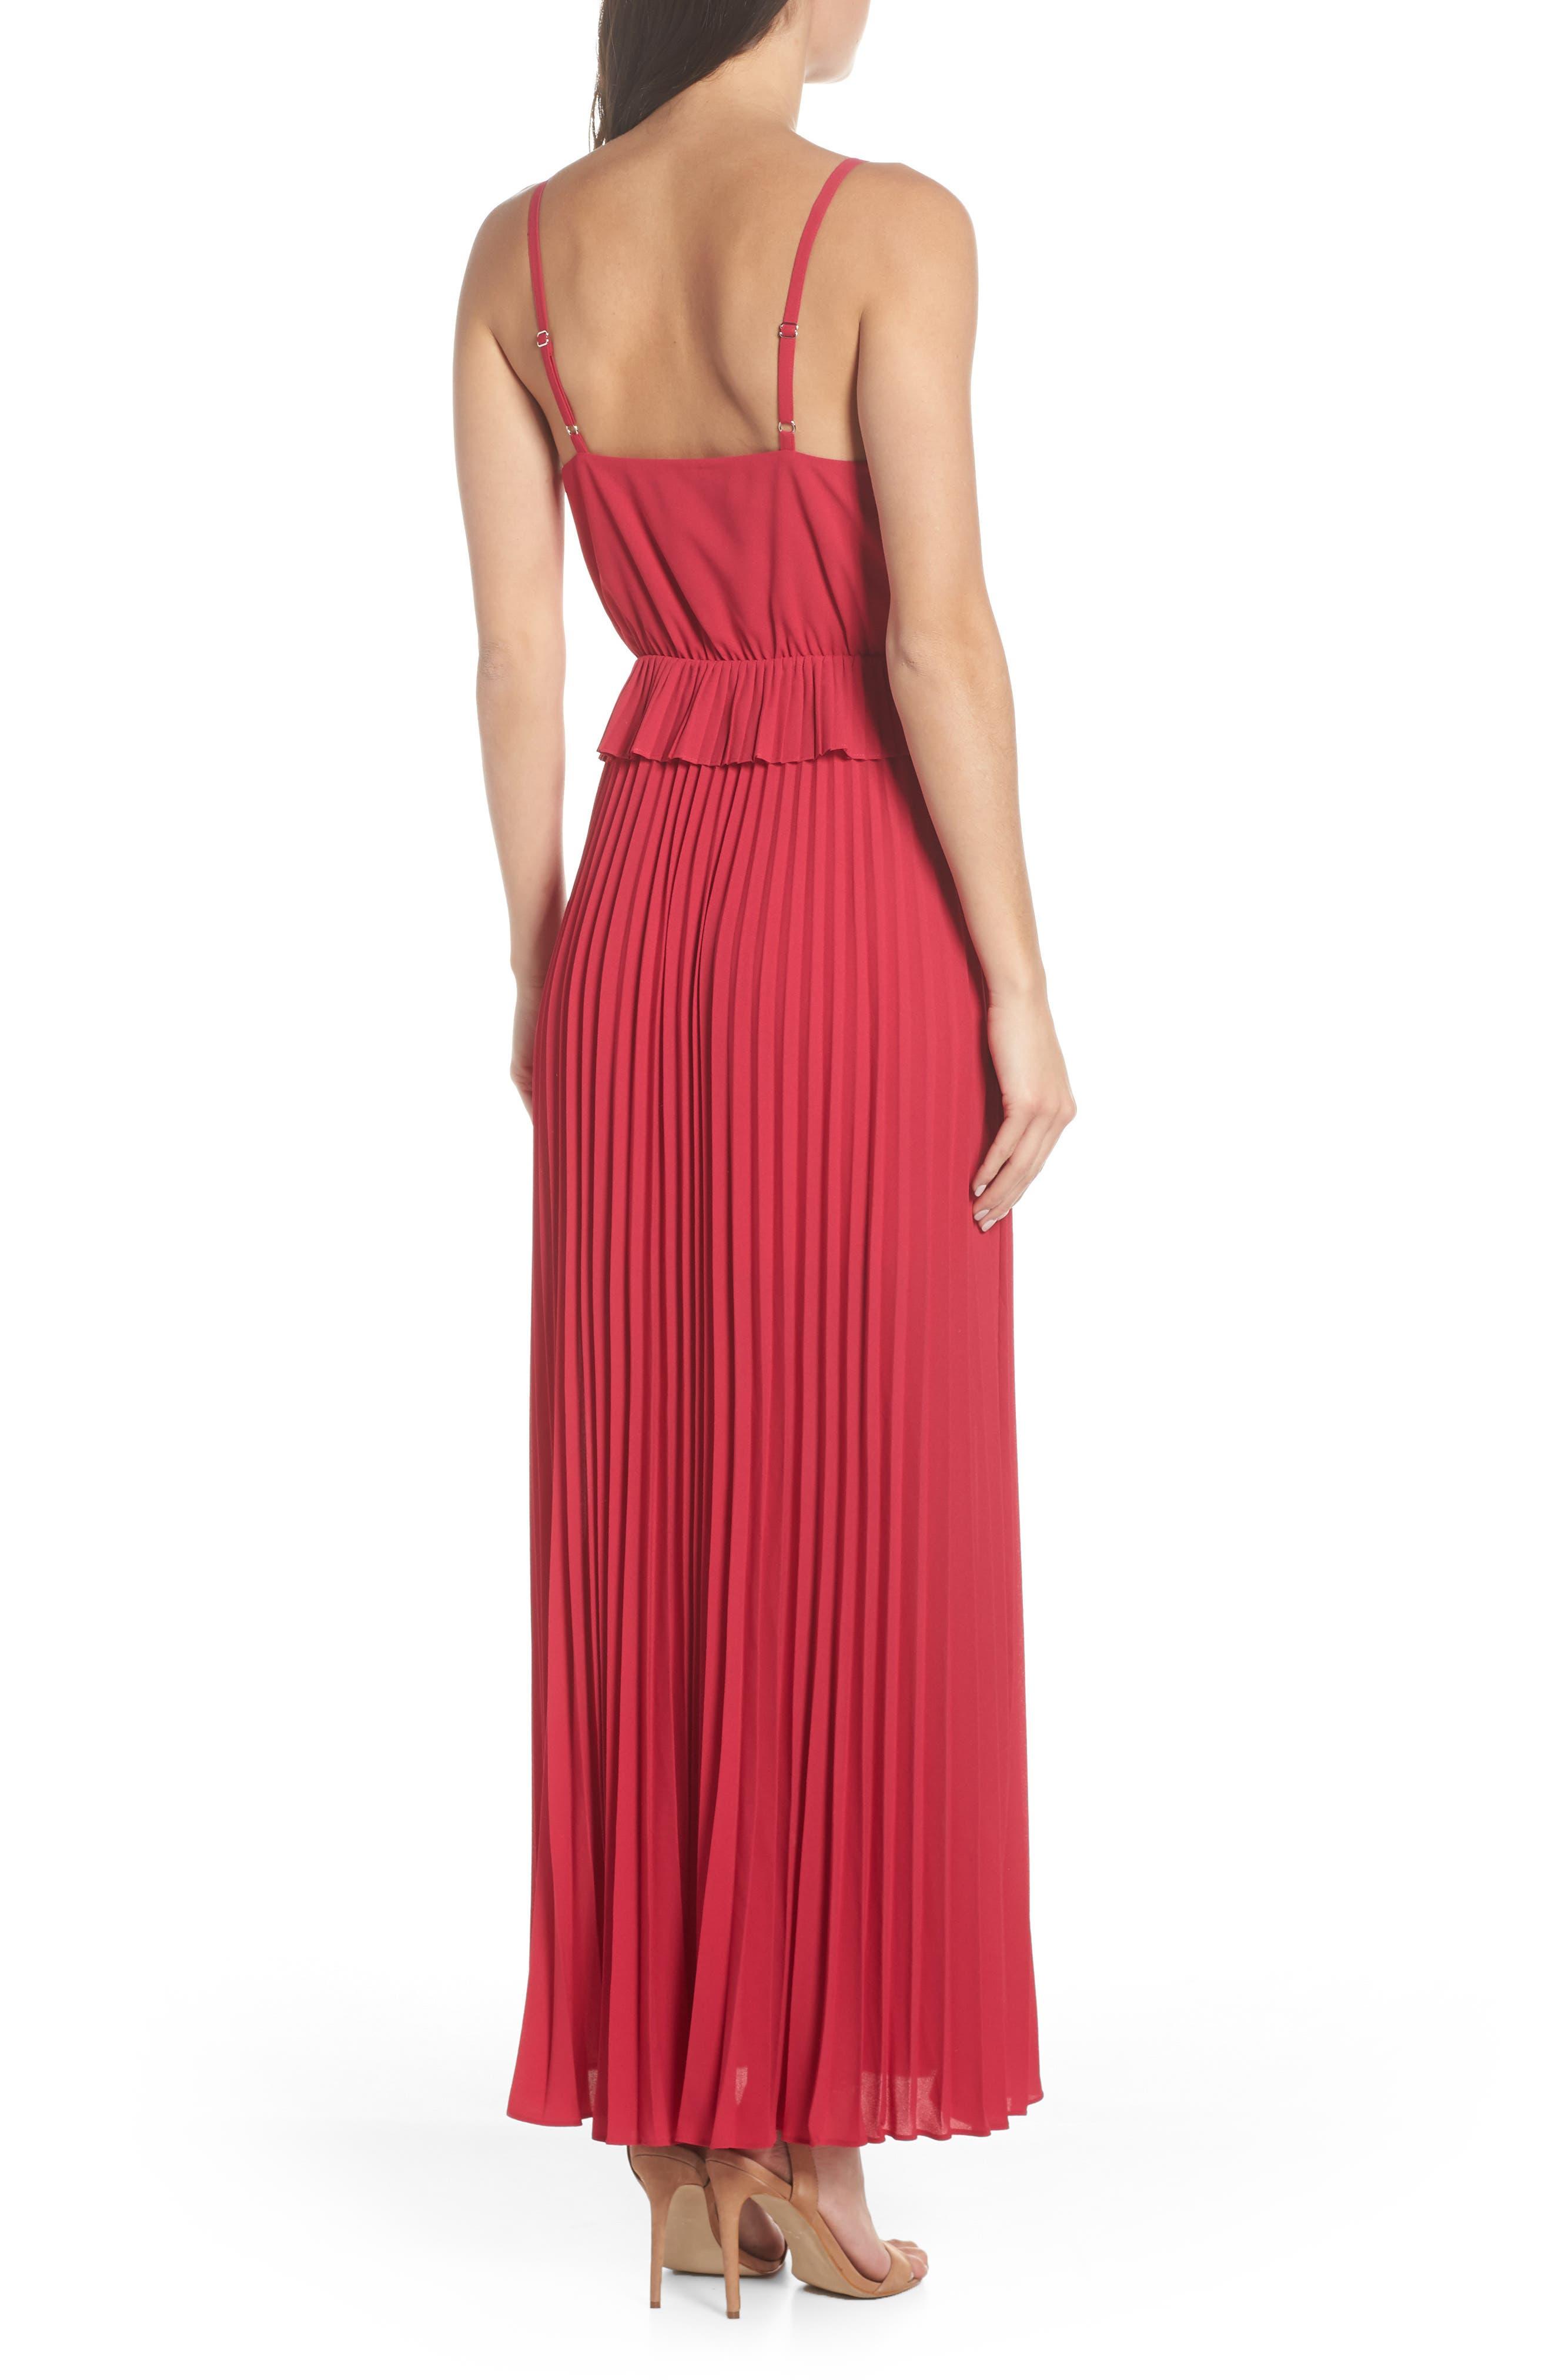 ALI & JAY, Olivet Pleated Maxi Dress, Alternate thumbnail 2, color, RASPBERRY